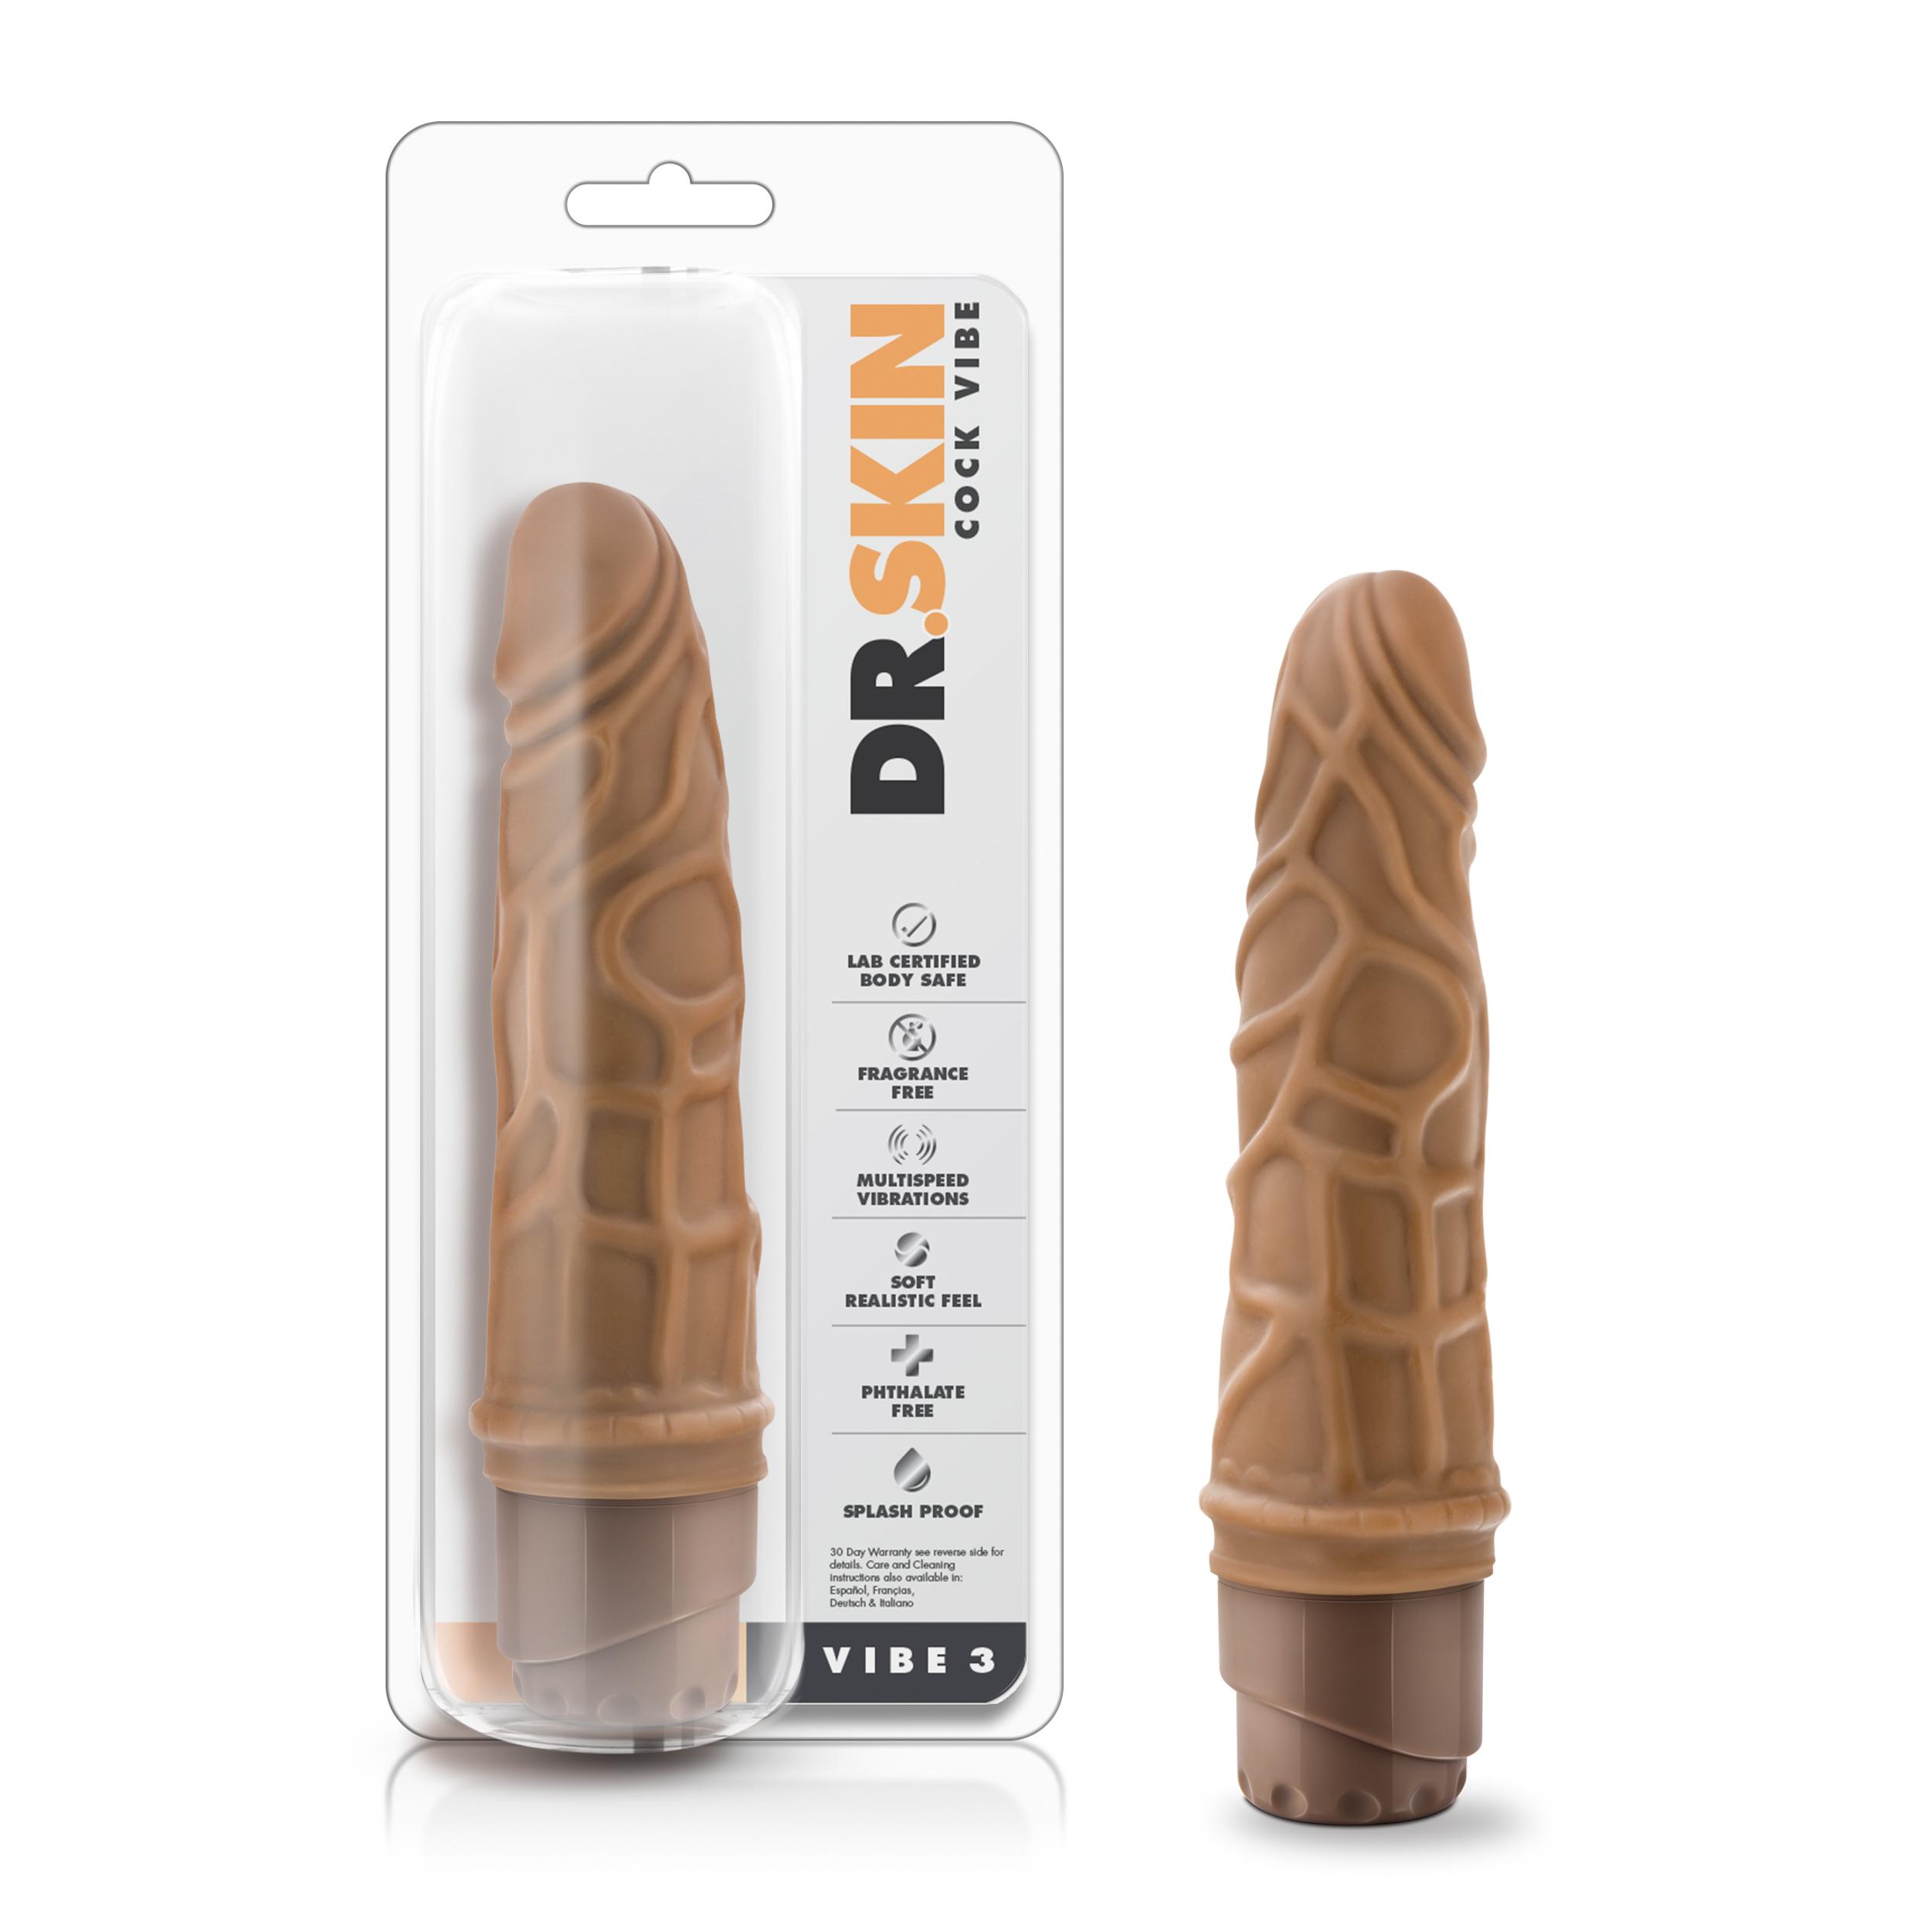 Dr. Skin - Cock Vibe 3 - 7.25 inch vibrating cock - Mocha